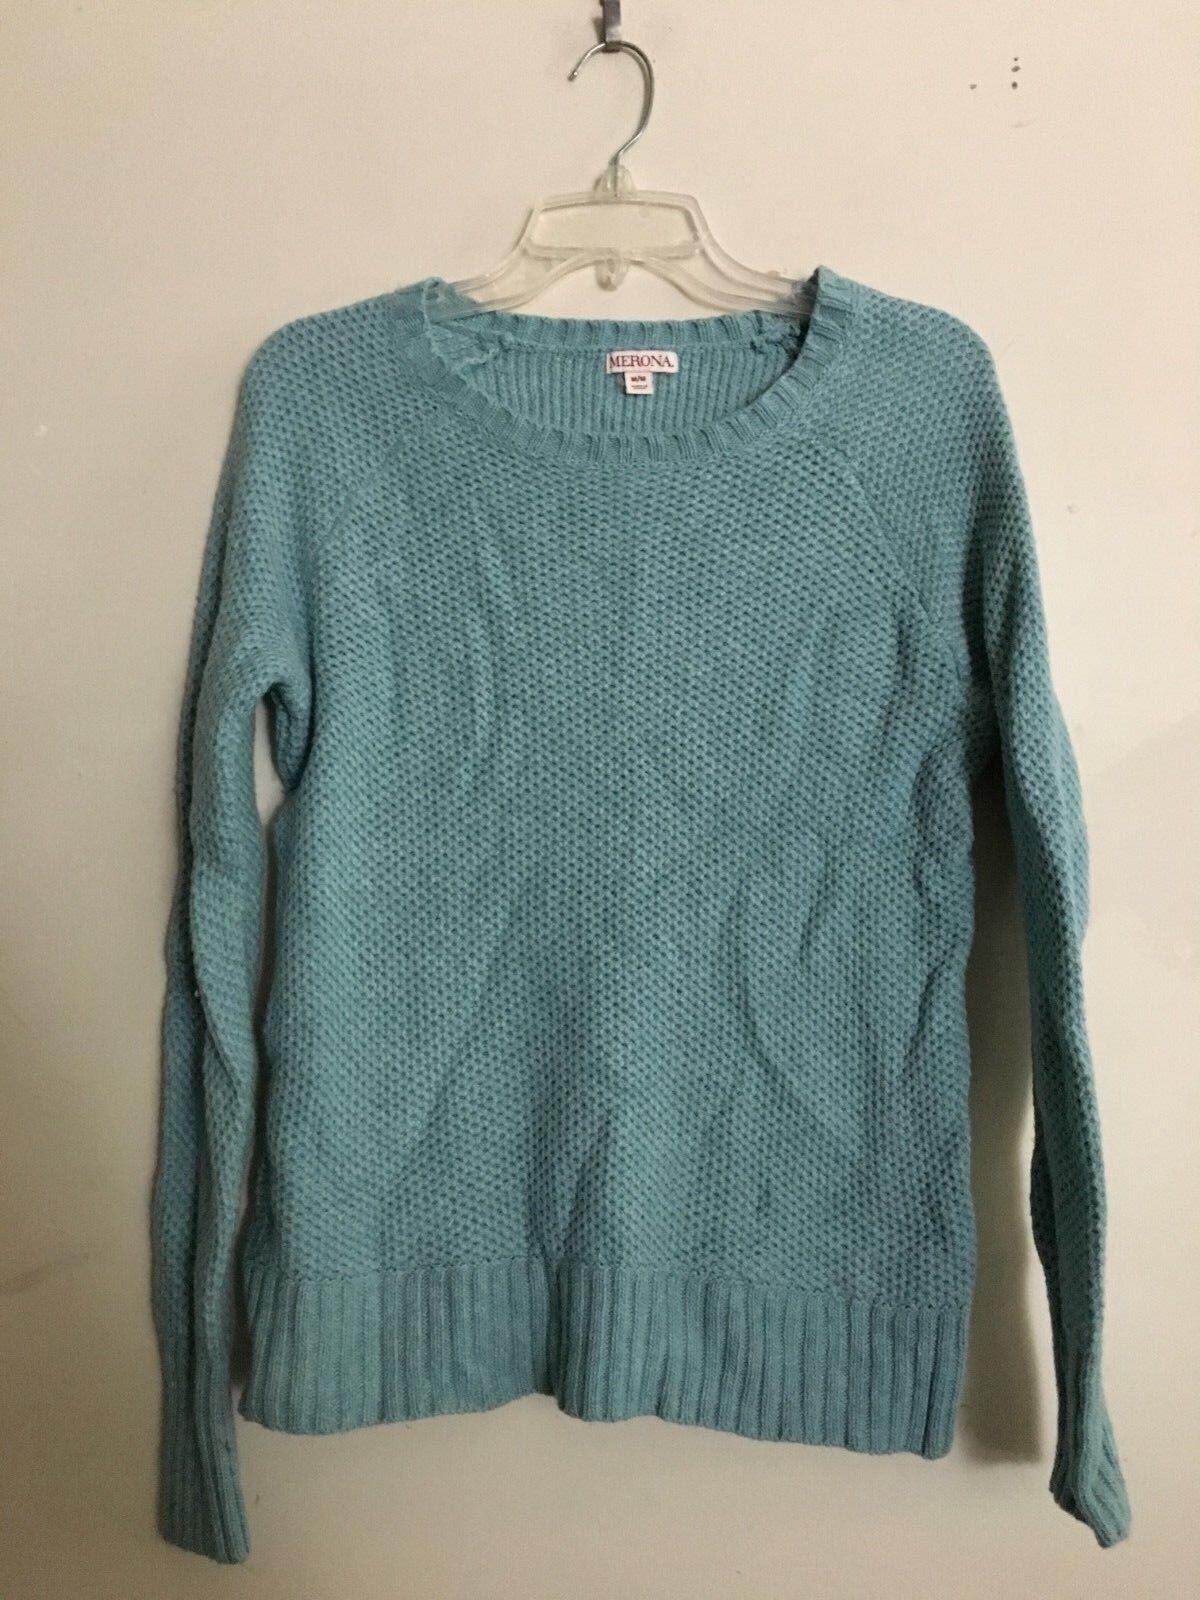 Merona Teal bluee Cotton Wool Blend Women Knit Sweater Size M